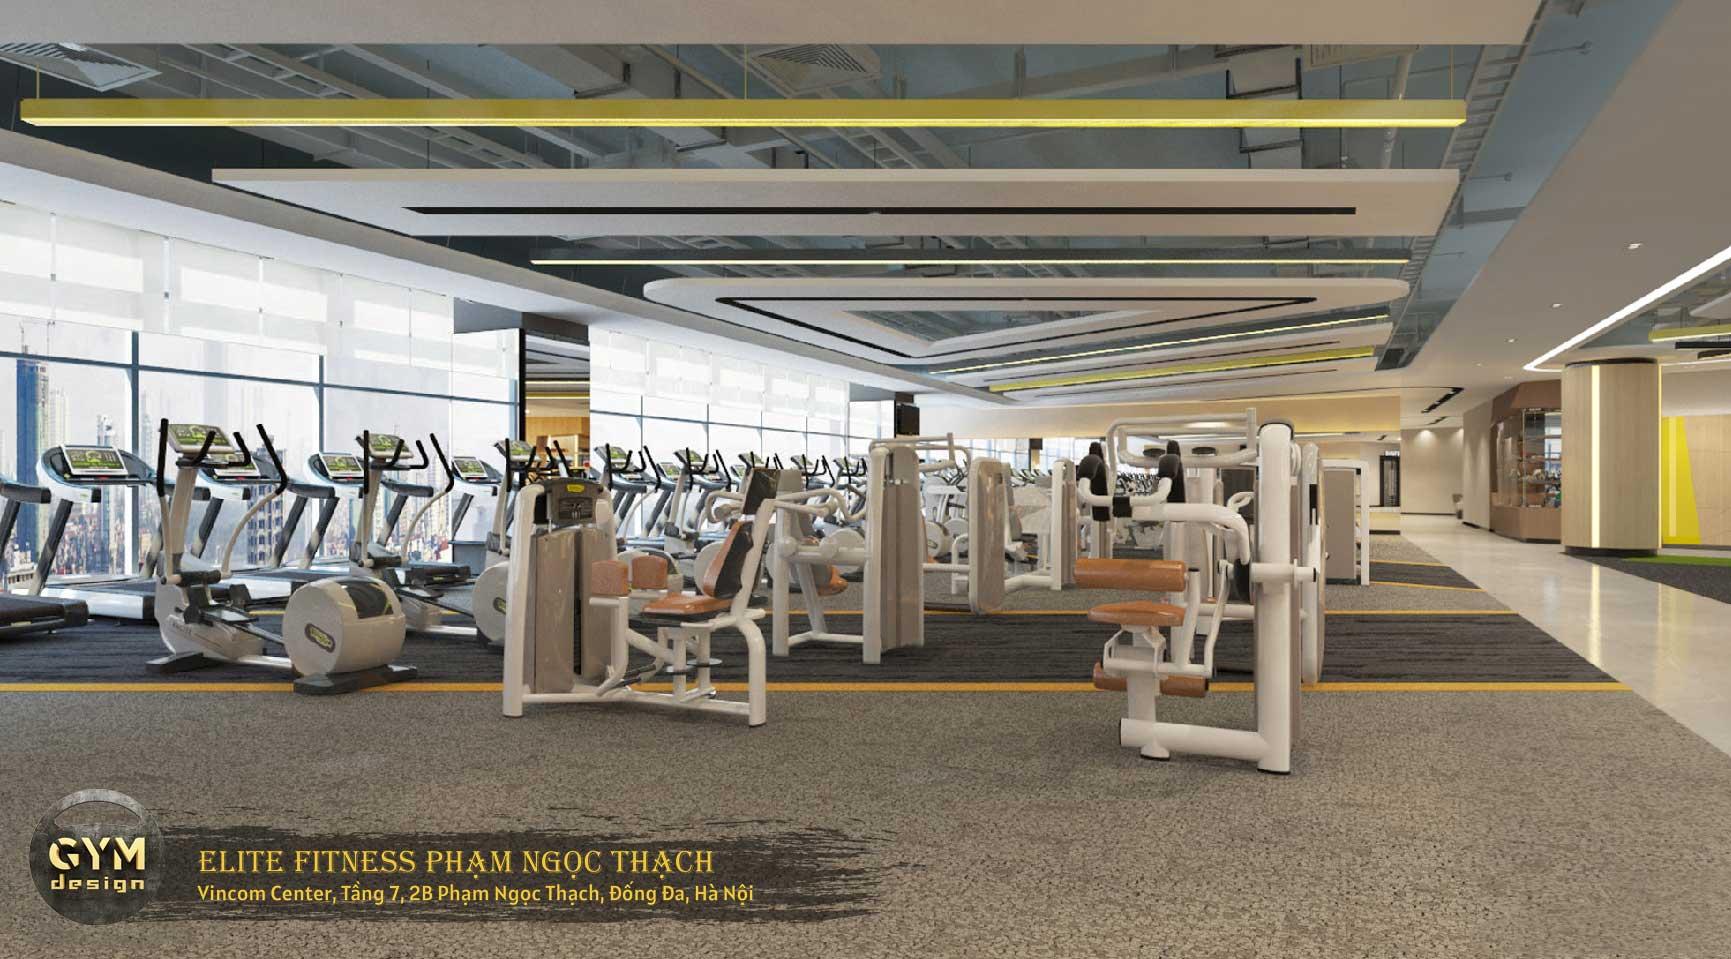 du-an-elite-fitness-pham-ngoc-thach-60